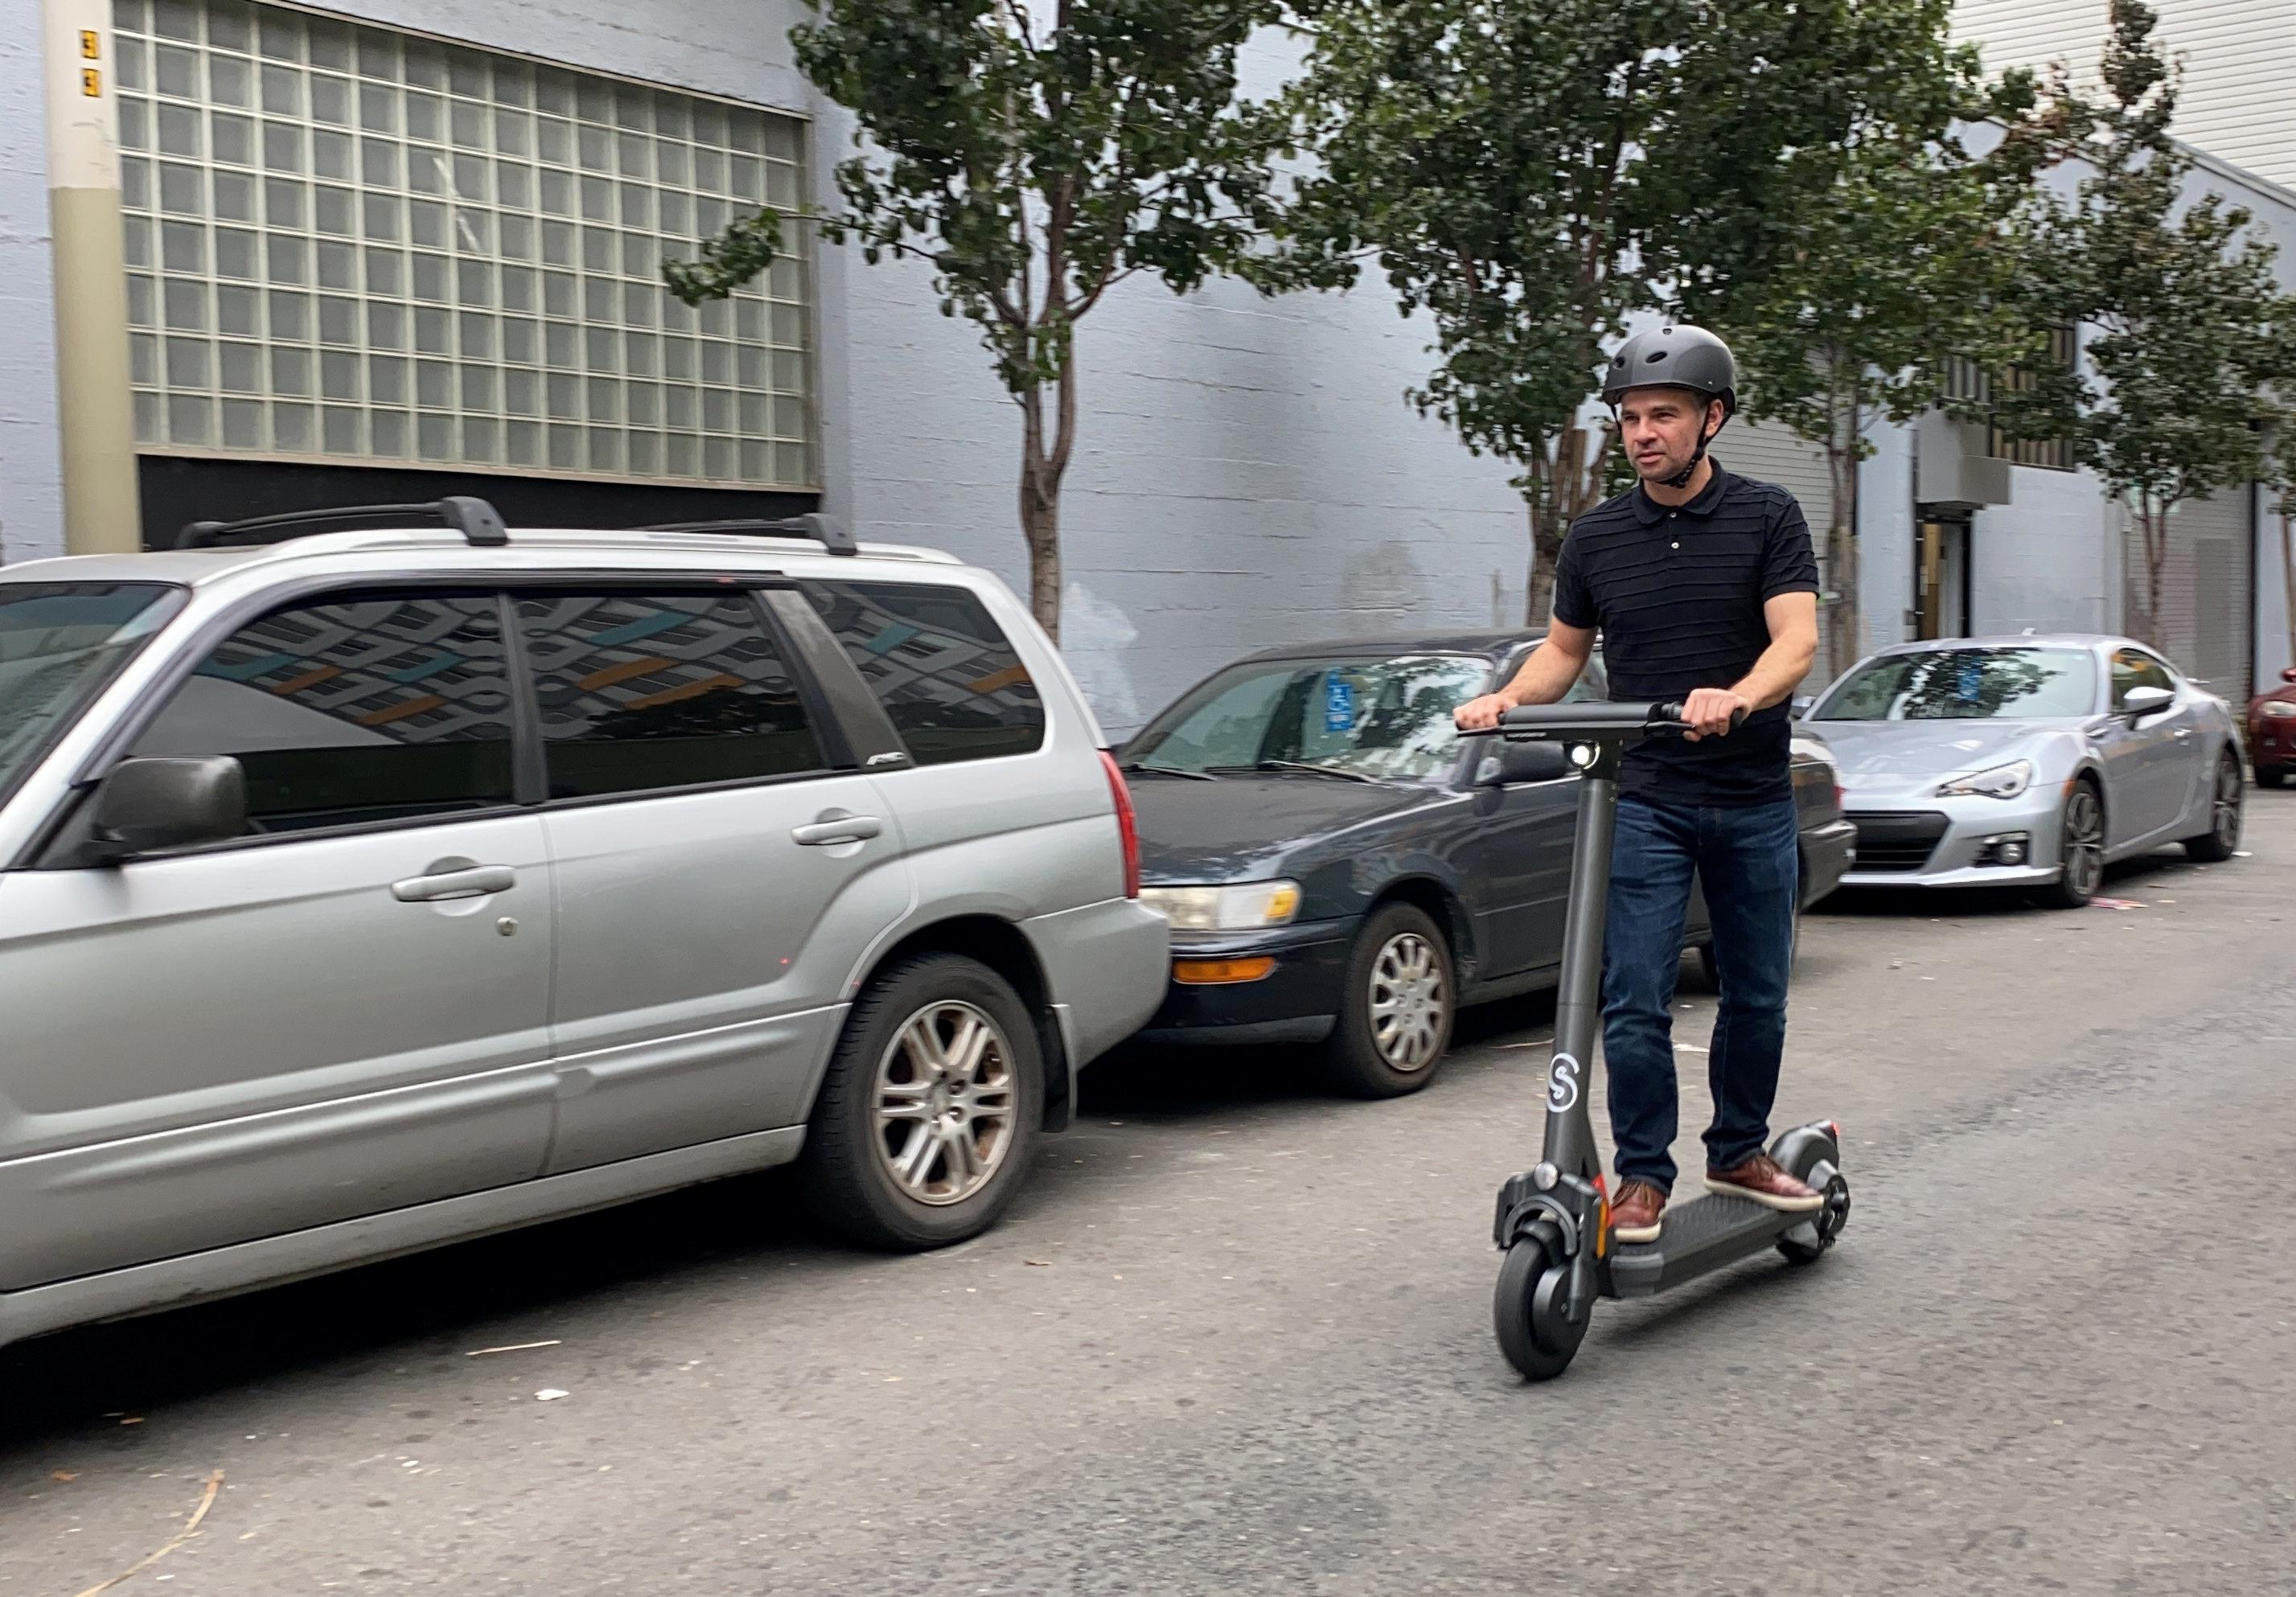 Scooter maker Superpedestrian raises $20 million, promises fewer...